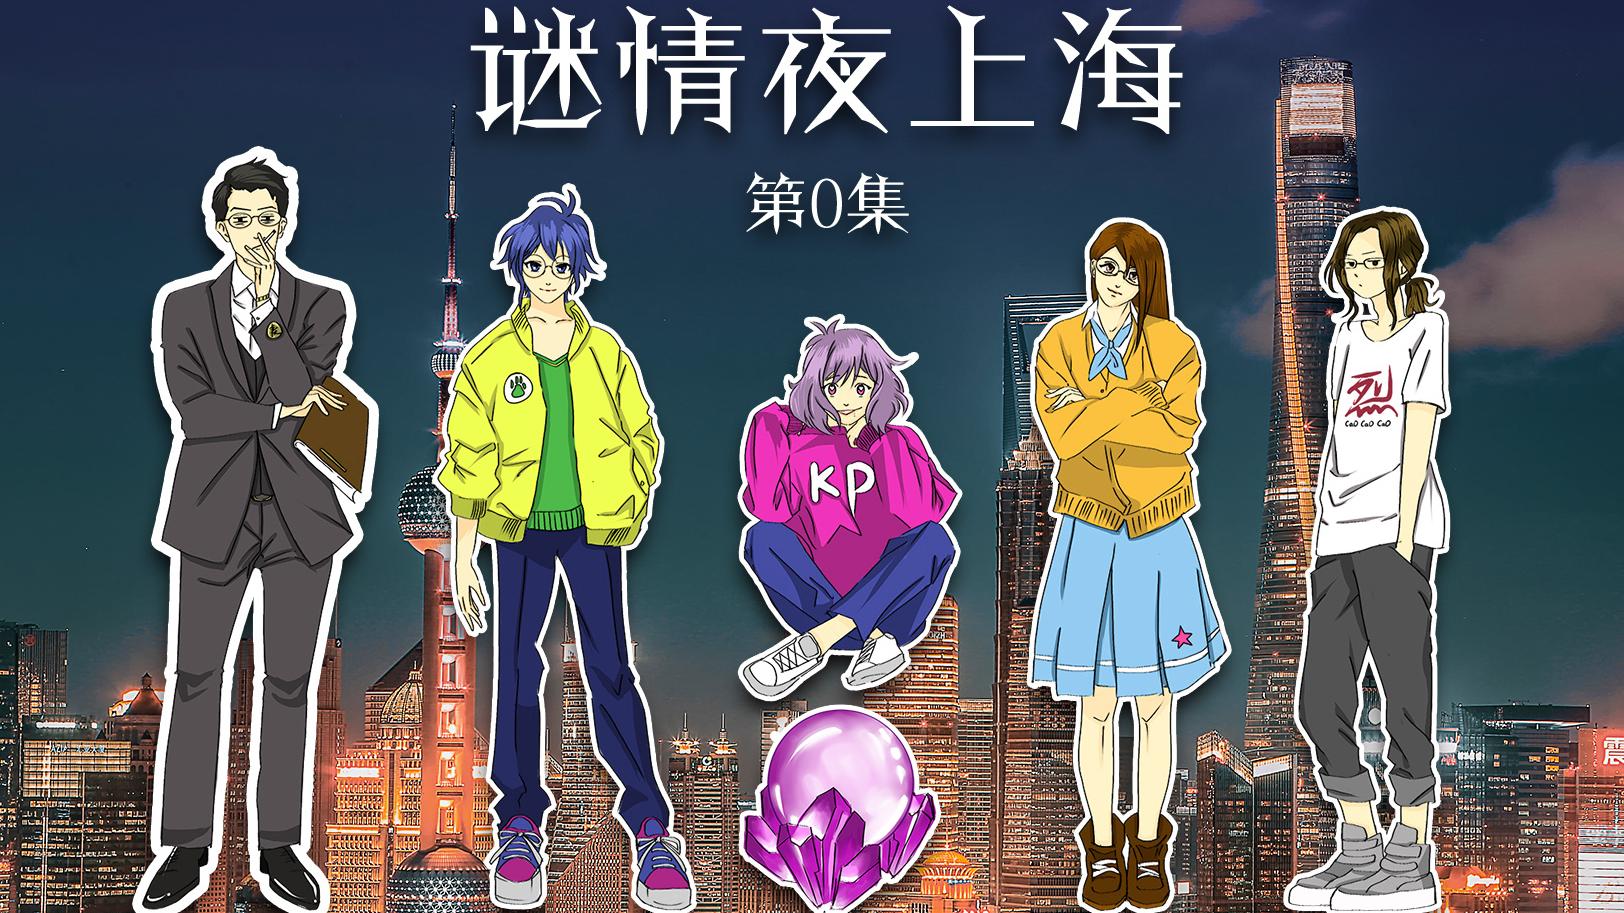 【coc跑团】谜情夜上海/00车卡回:我一张白纸